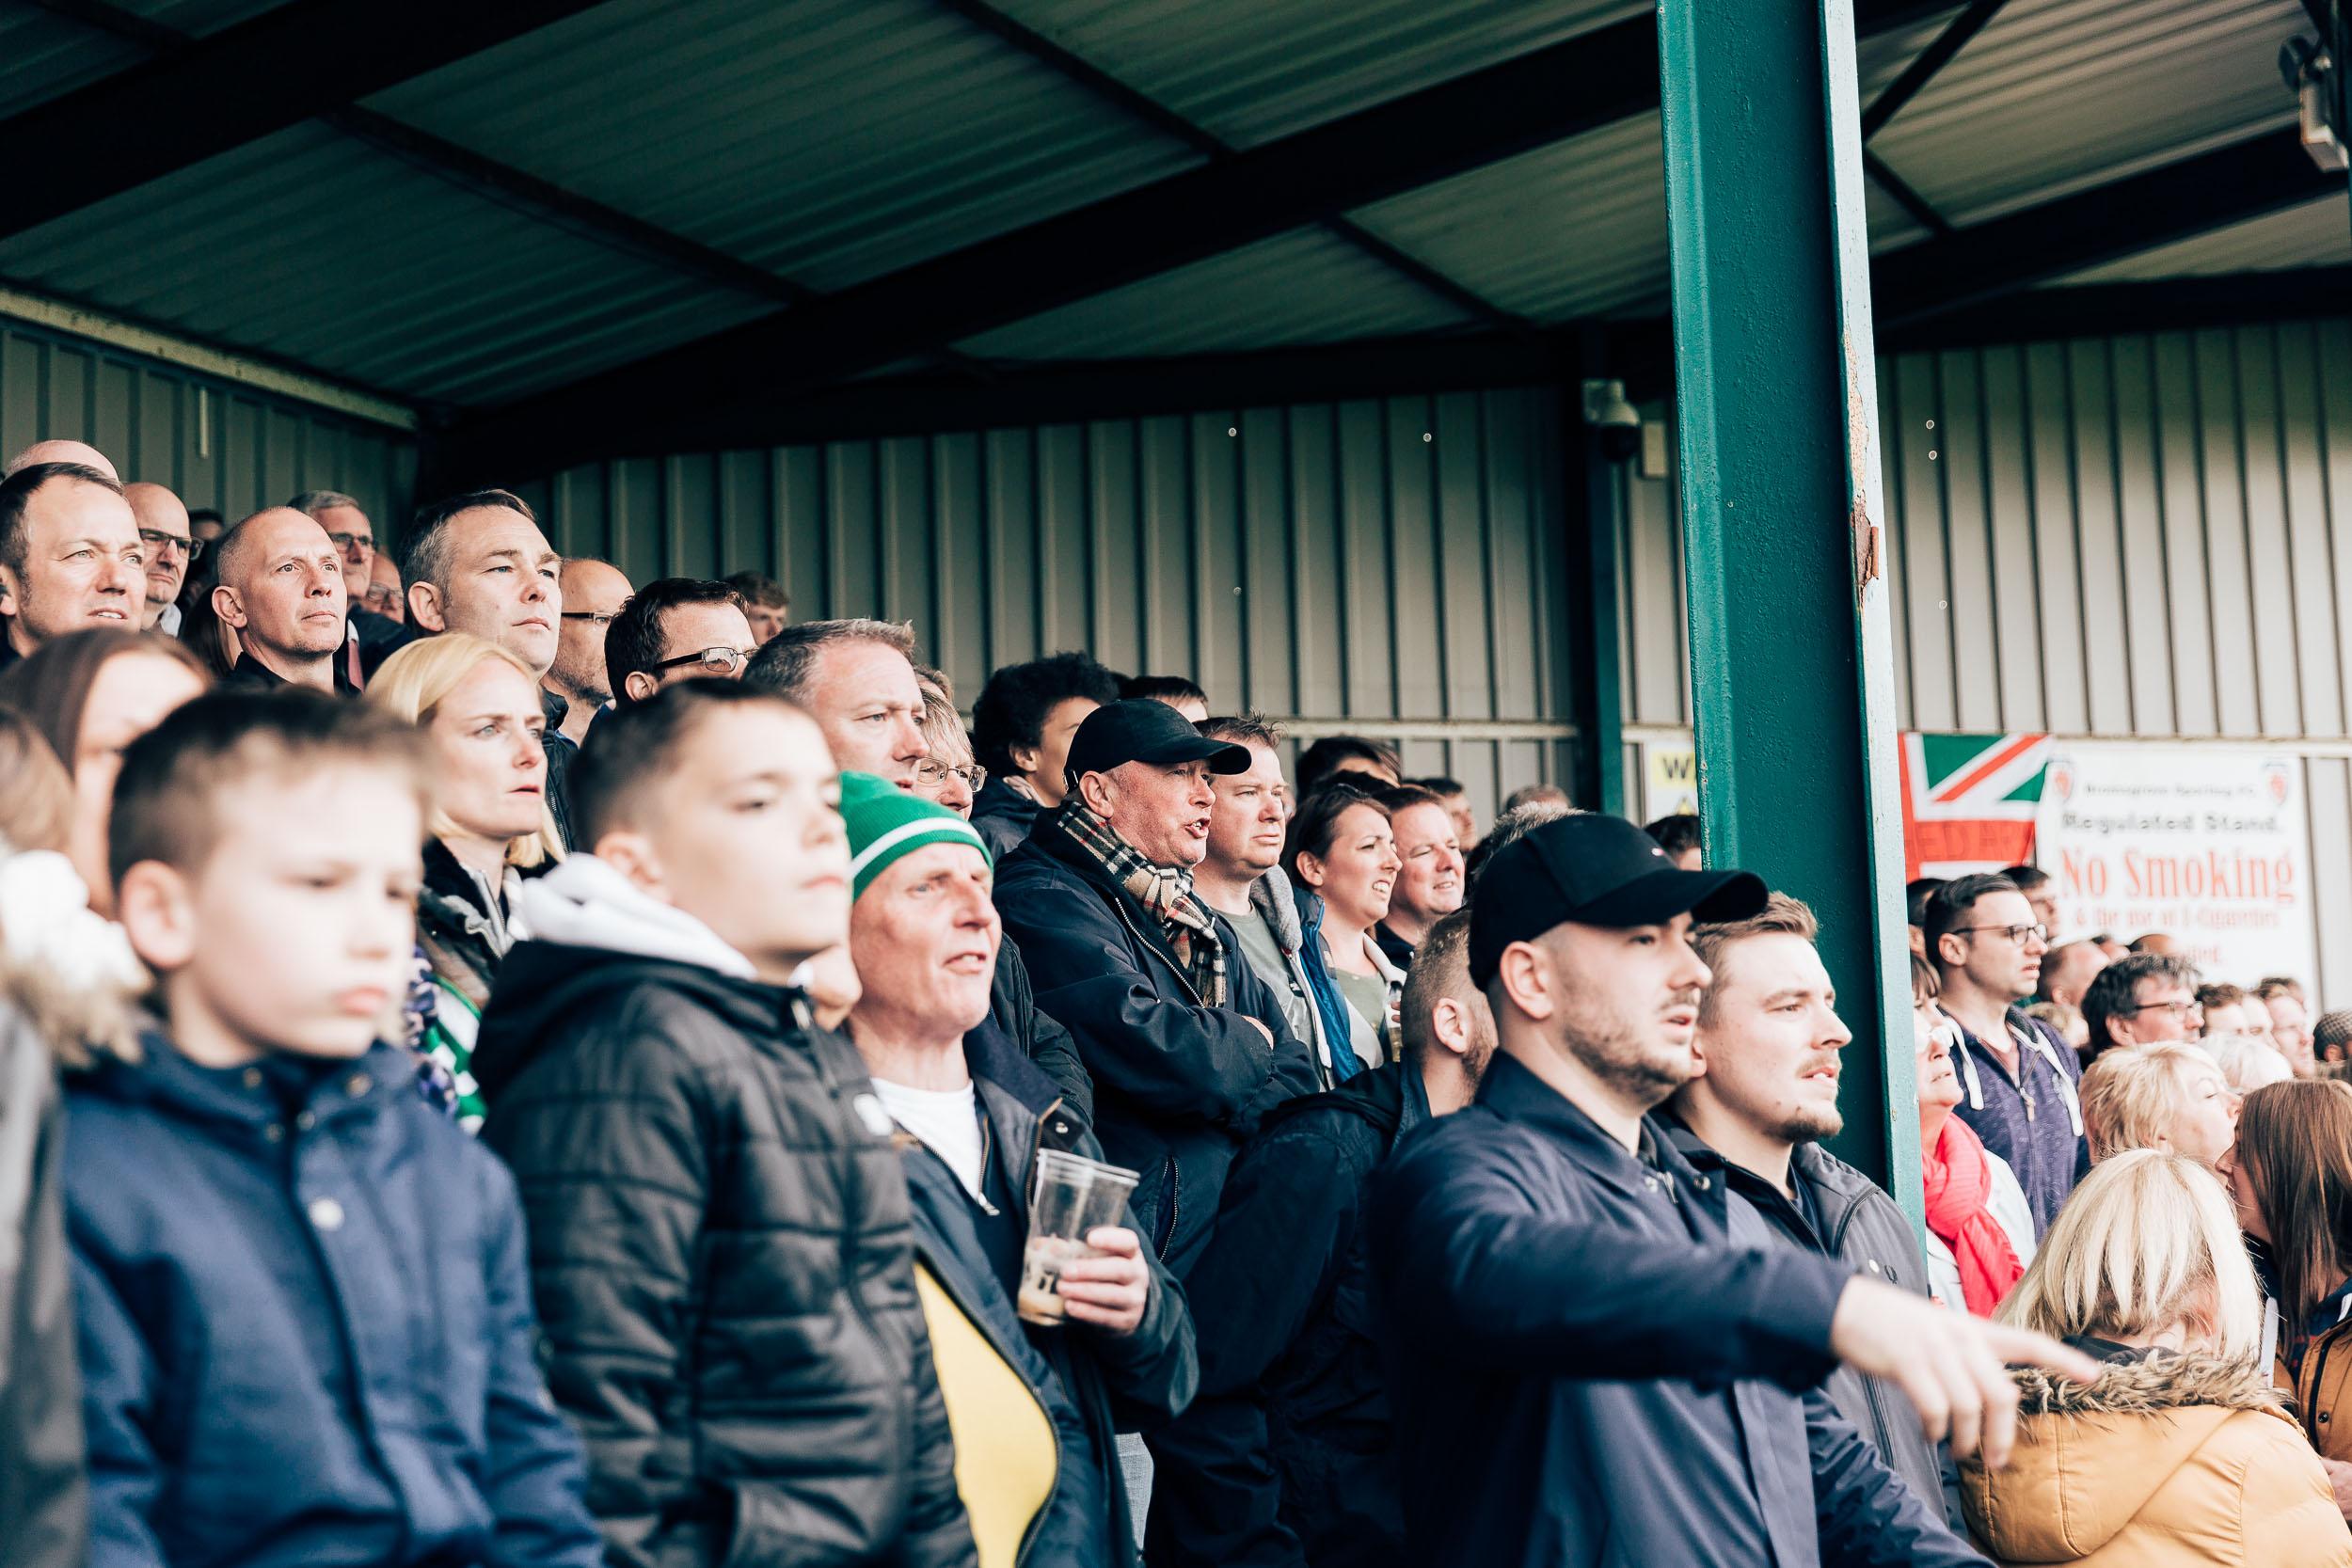 06_05_2019_Bromsgrove_Sporting_Corby-104.jpg